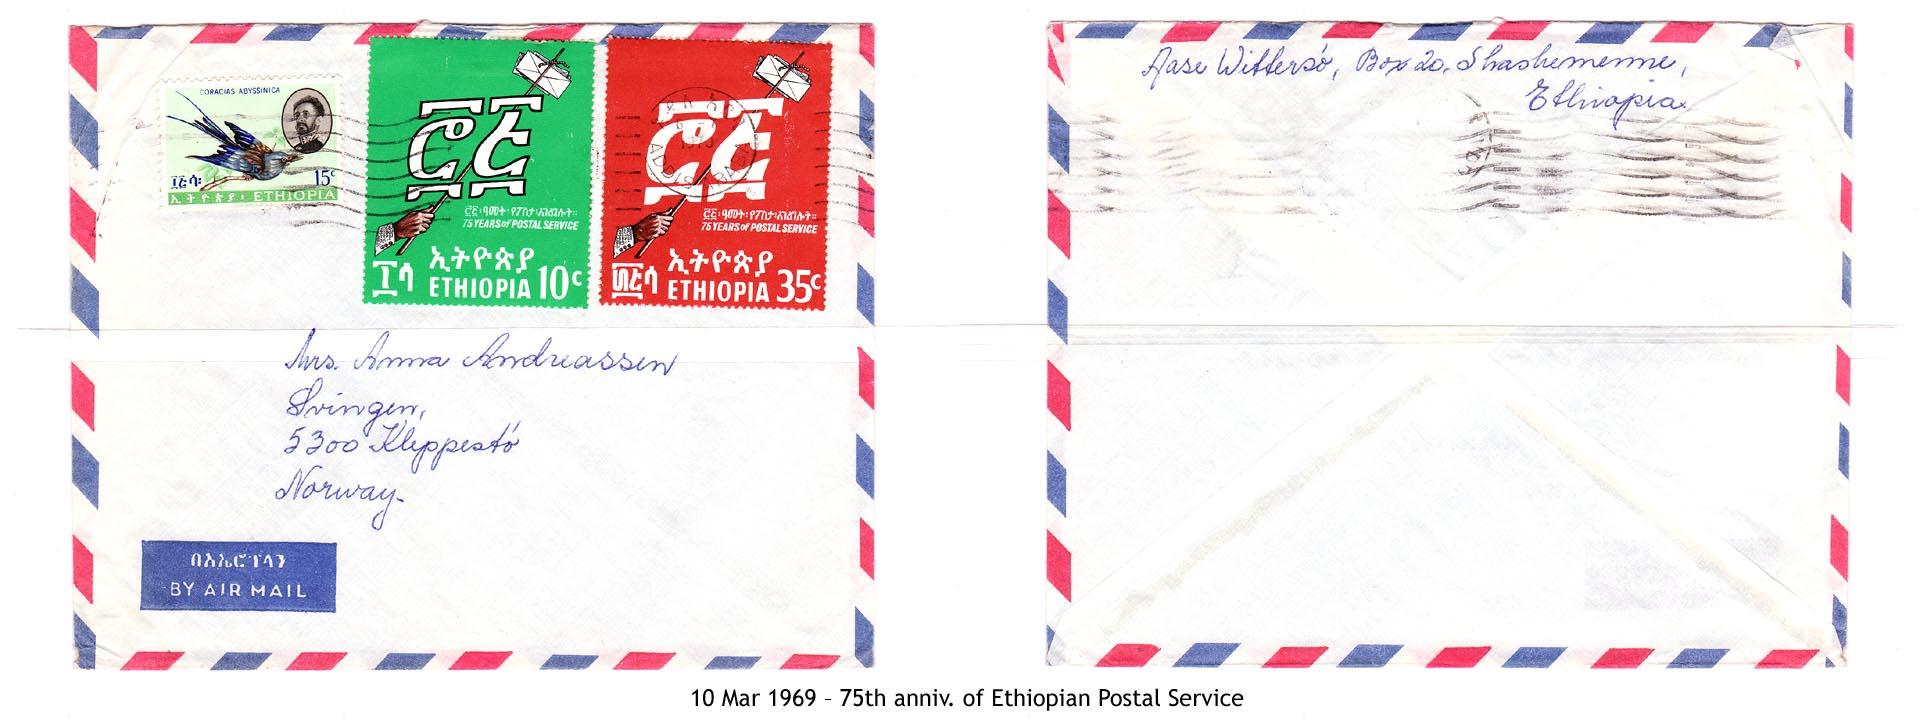 19690310 – 75th anniv. of Ethiopian Postal Service